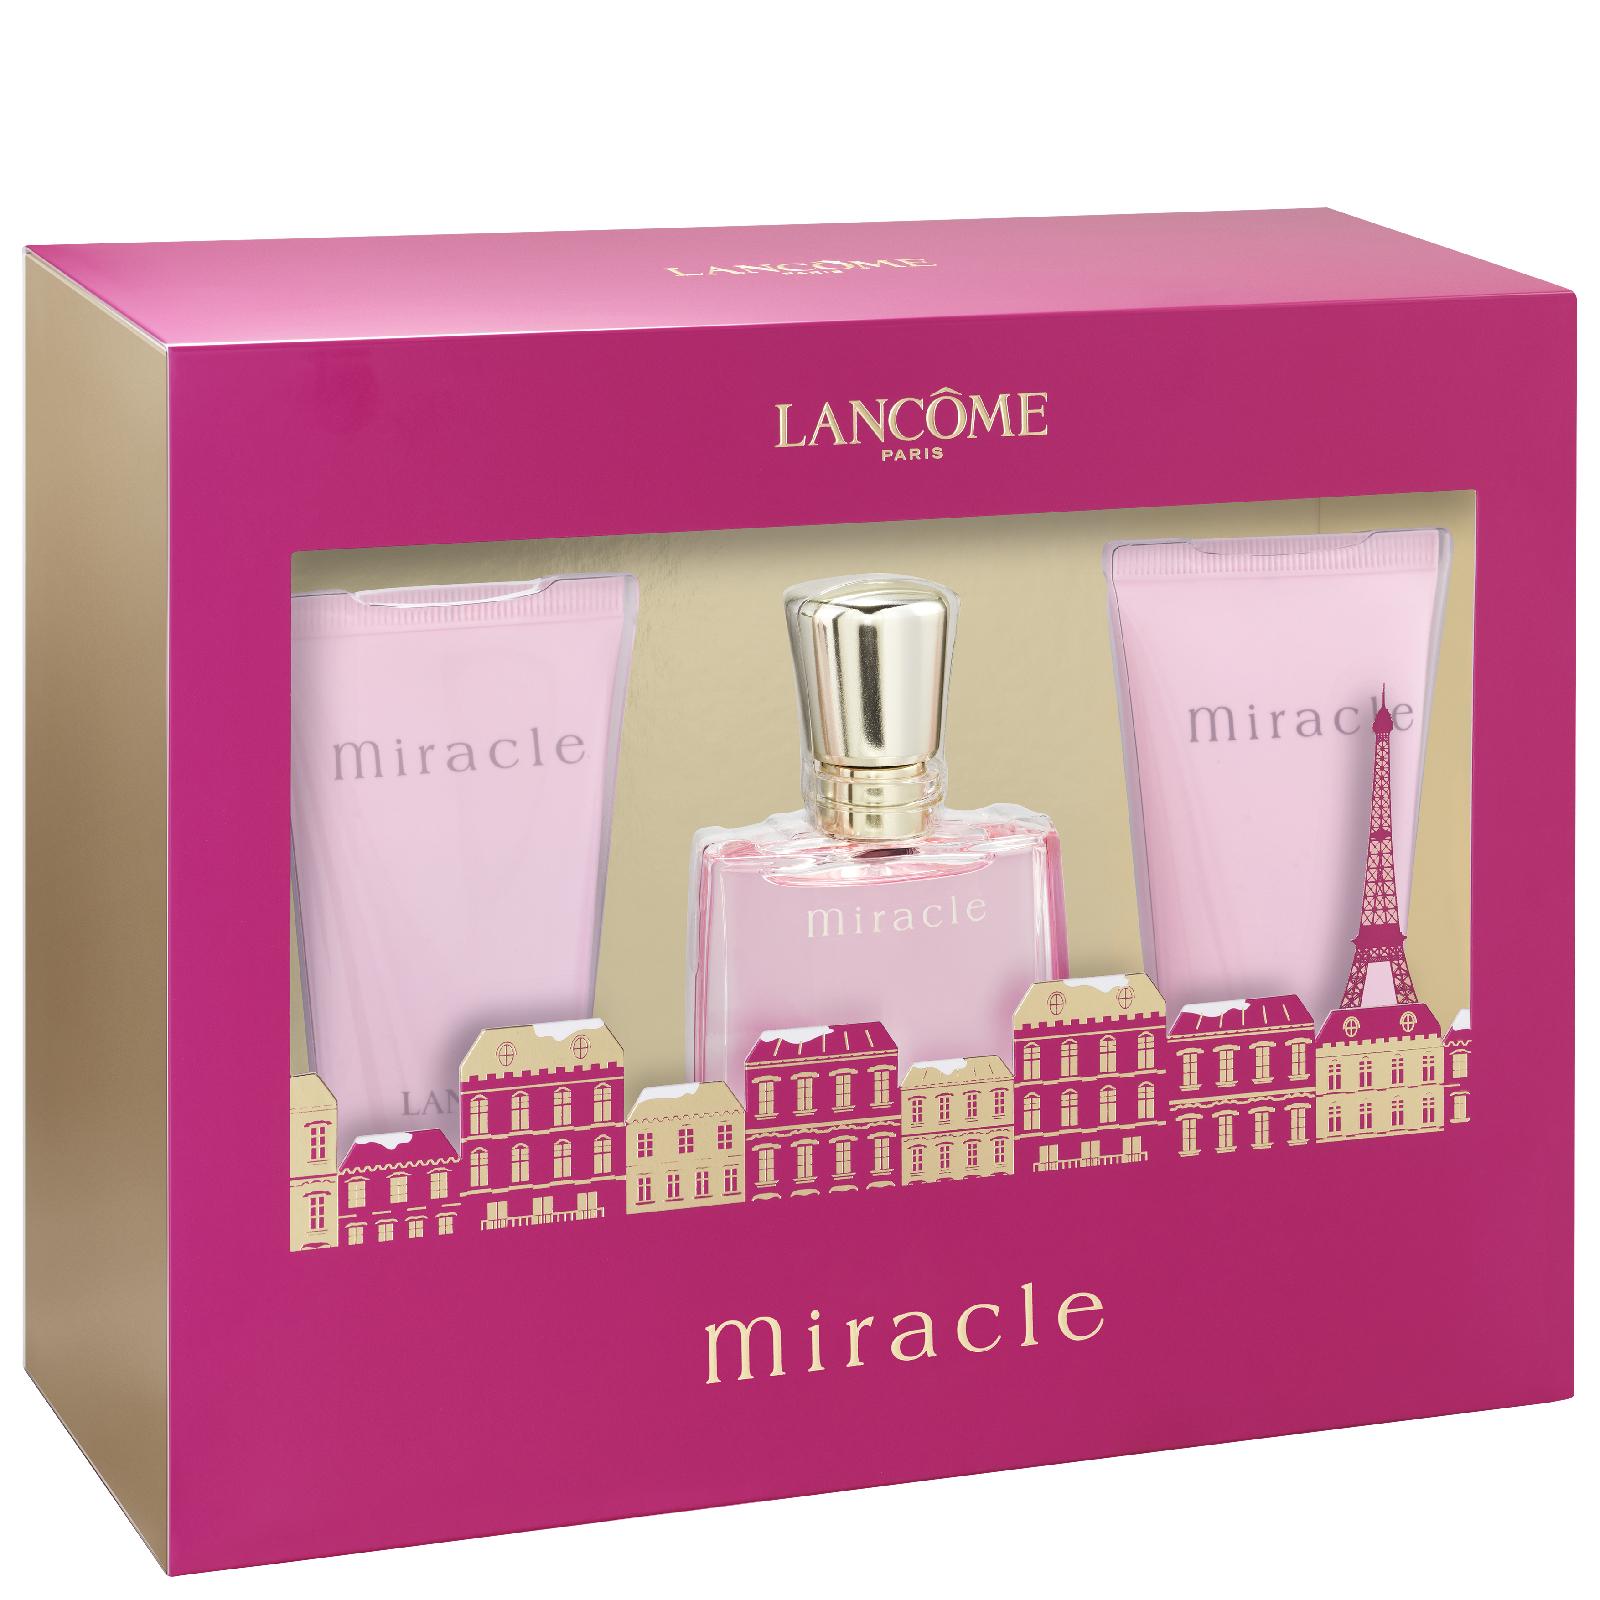 Lancôme Miracle Eau De Parfum Coffret 30ml Free Shipping